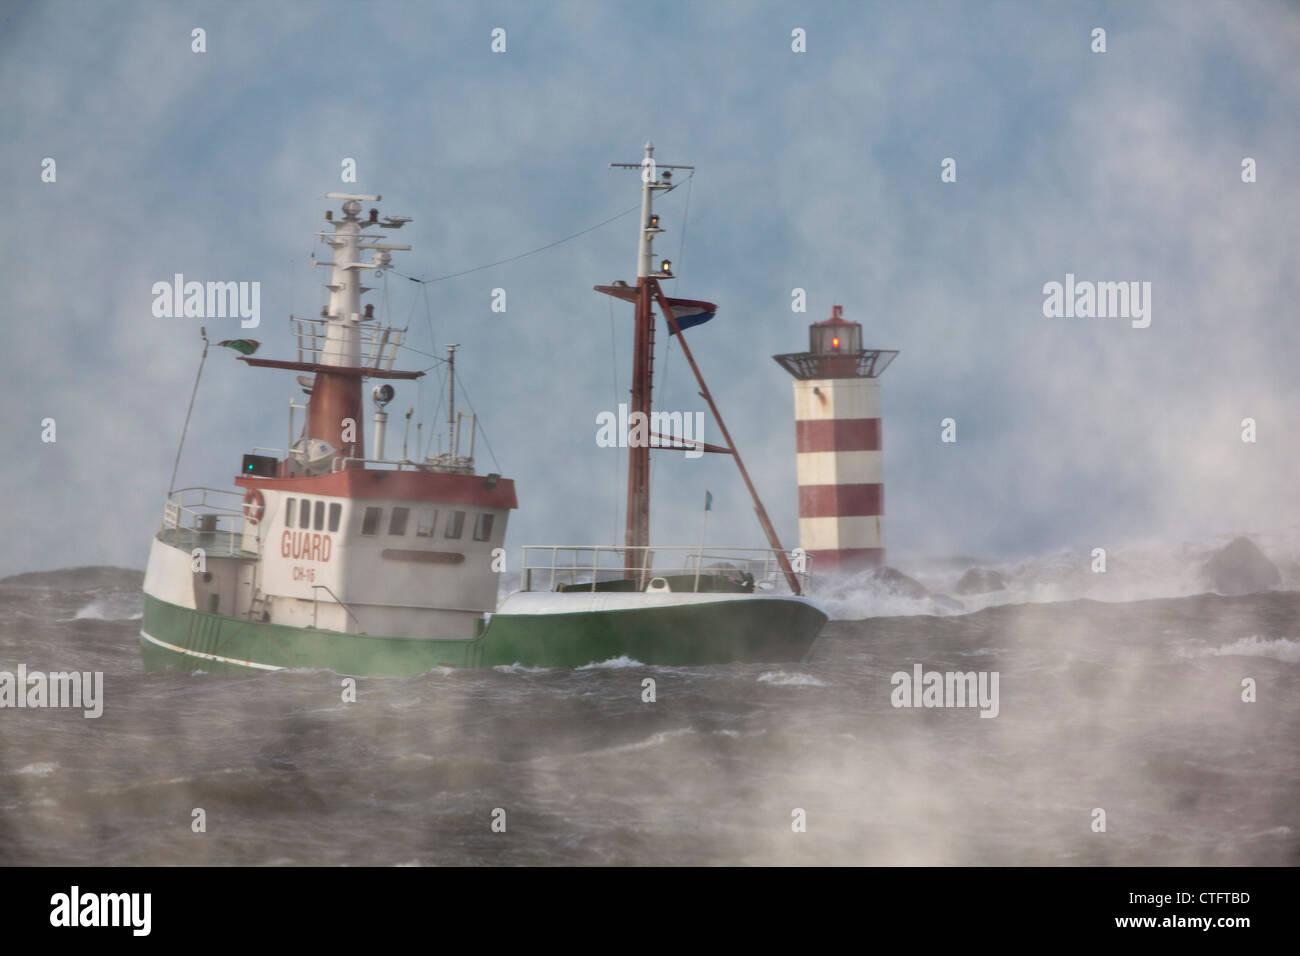 The Netherlands, IJmuiden, Storm. Waves smash against lighthouse or beacon. Ship. - Stock Image